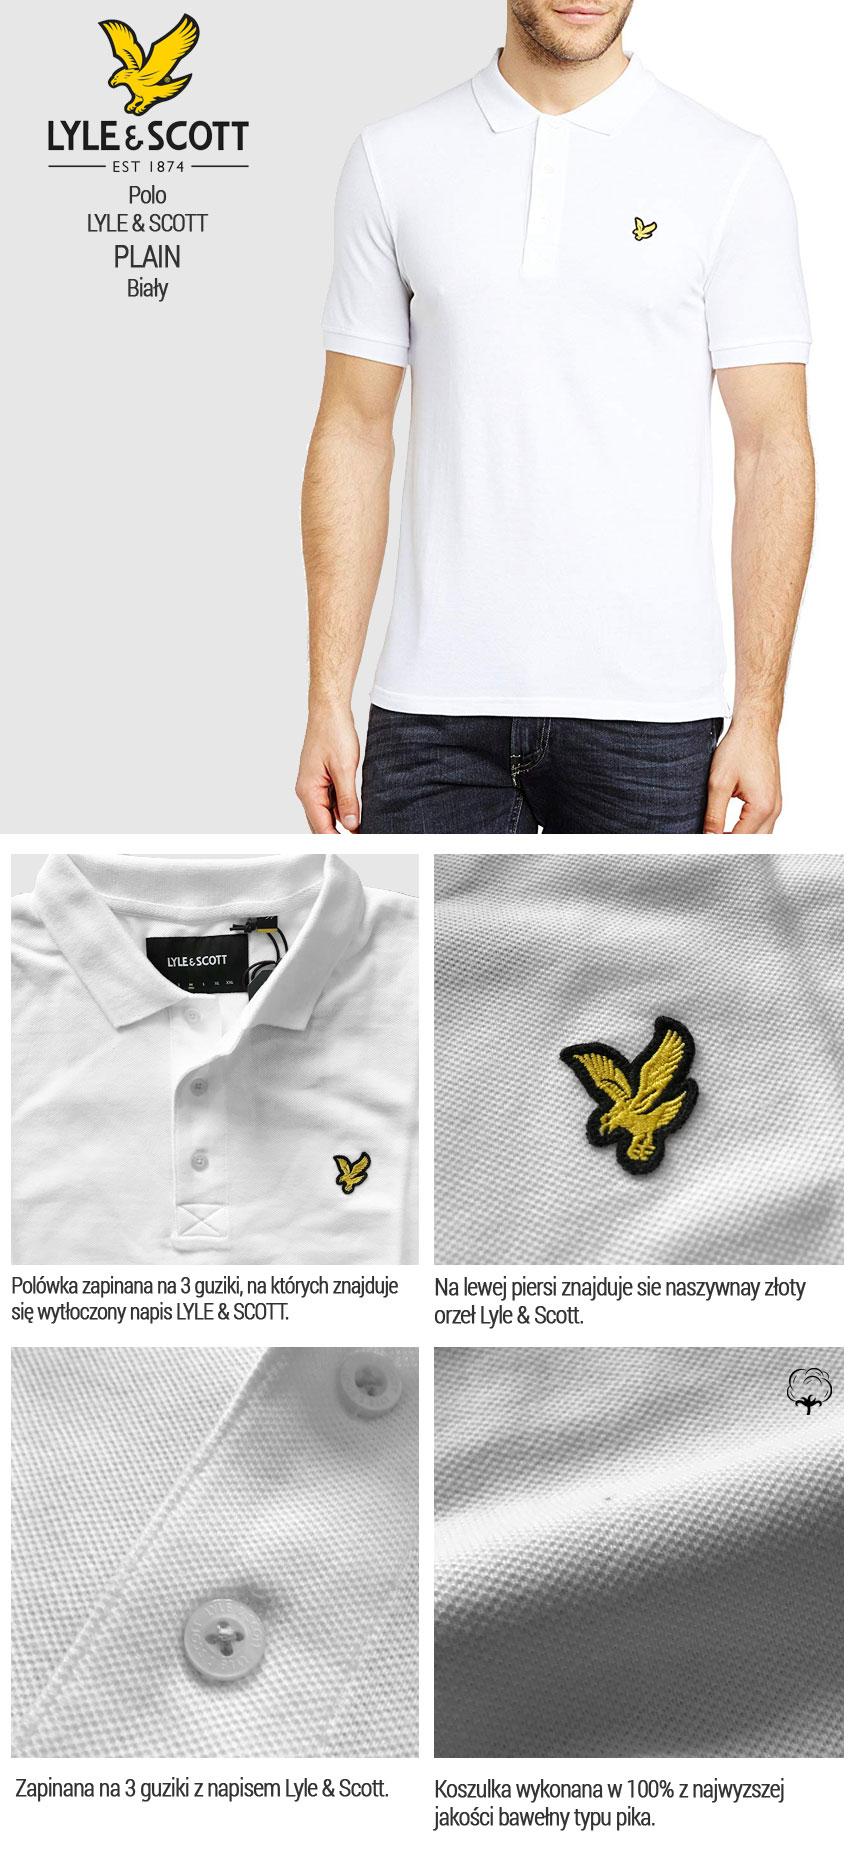 Koszulka Polo LYLE & SCOTT biała